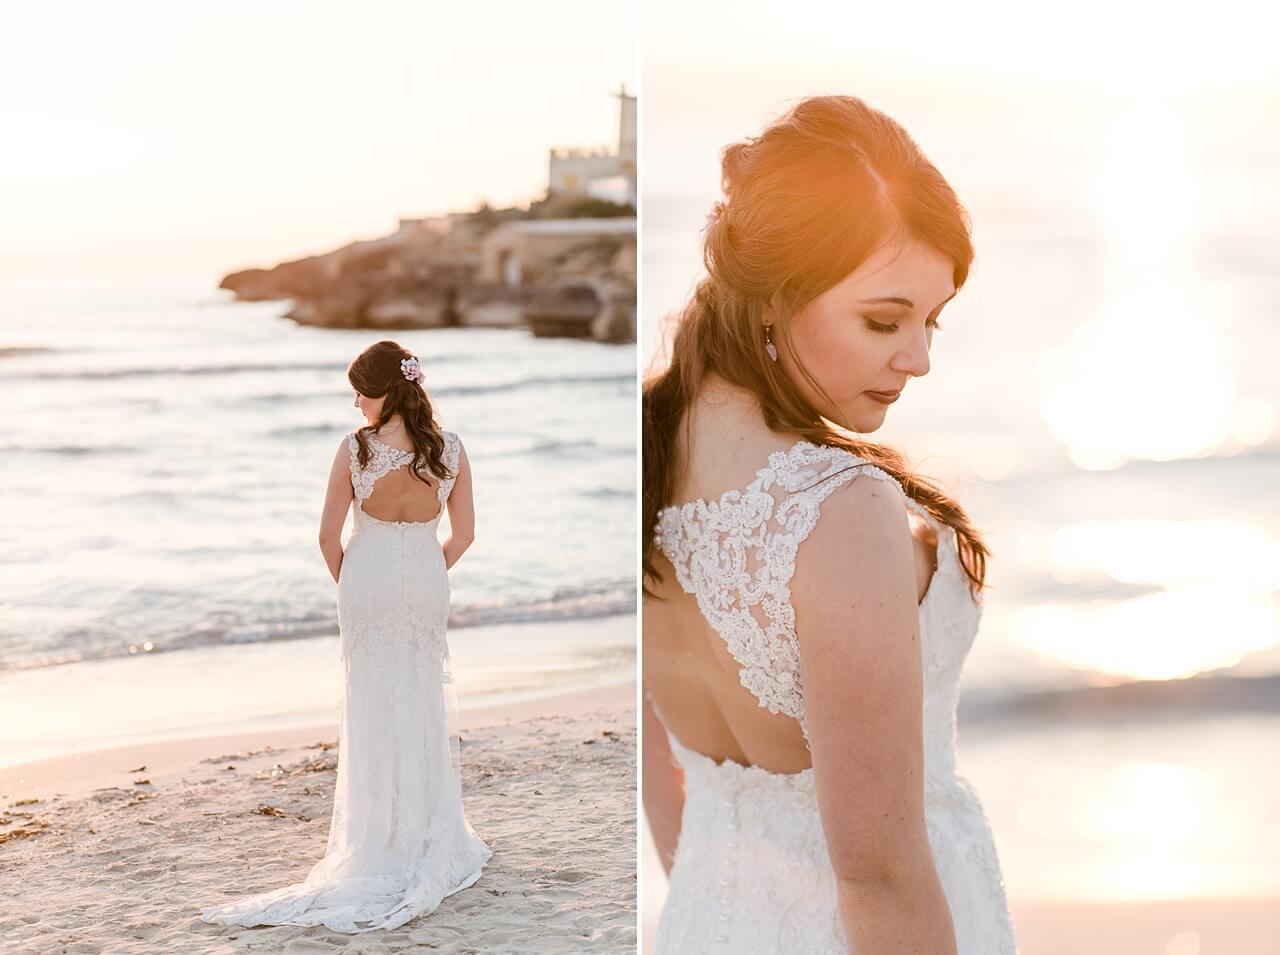 Rebecca Conte Fotografie: After Wedding Shoot Mallorca 20